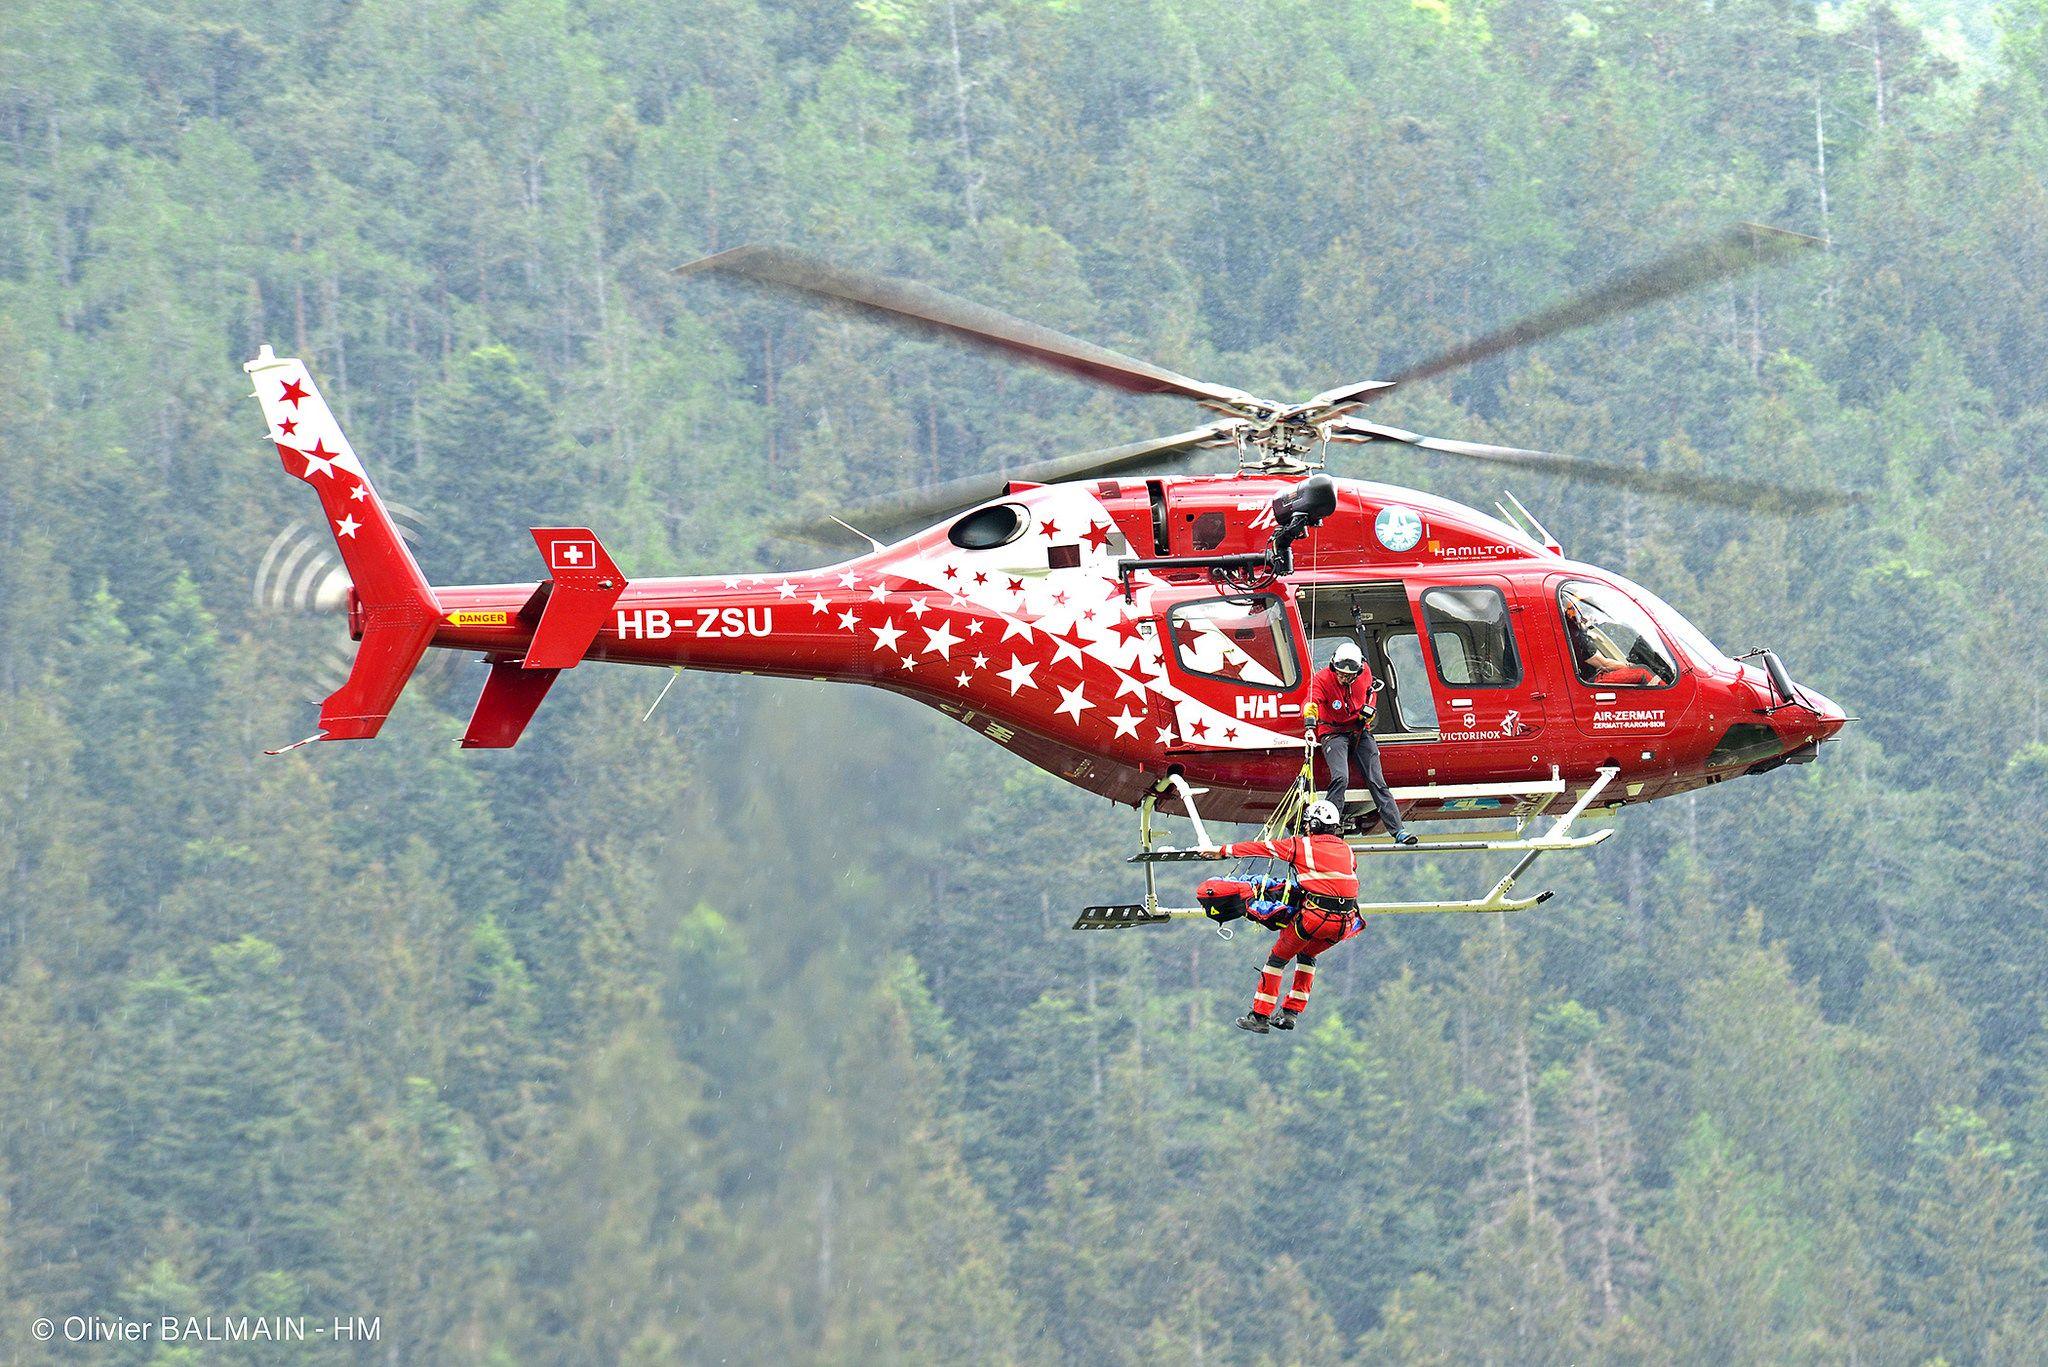 Bell 429 Air Zermatt Treuillage Secours En Montagne Zermatt Life Flight Helicopter Helicopter